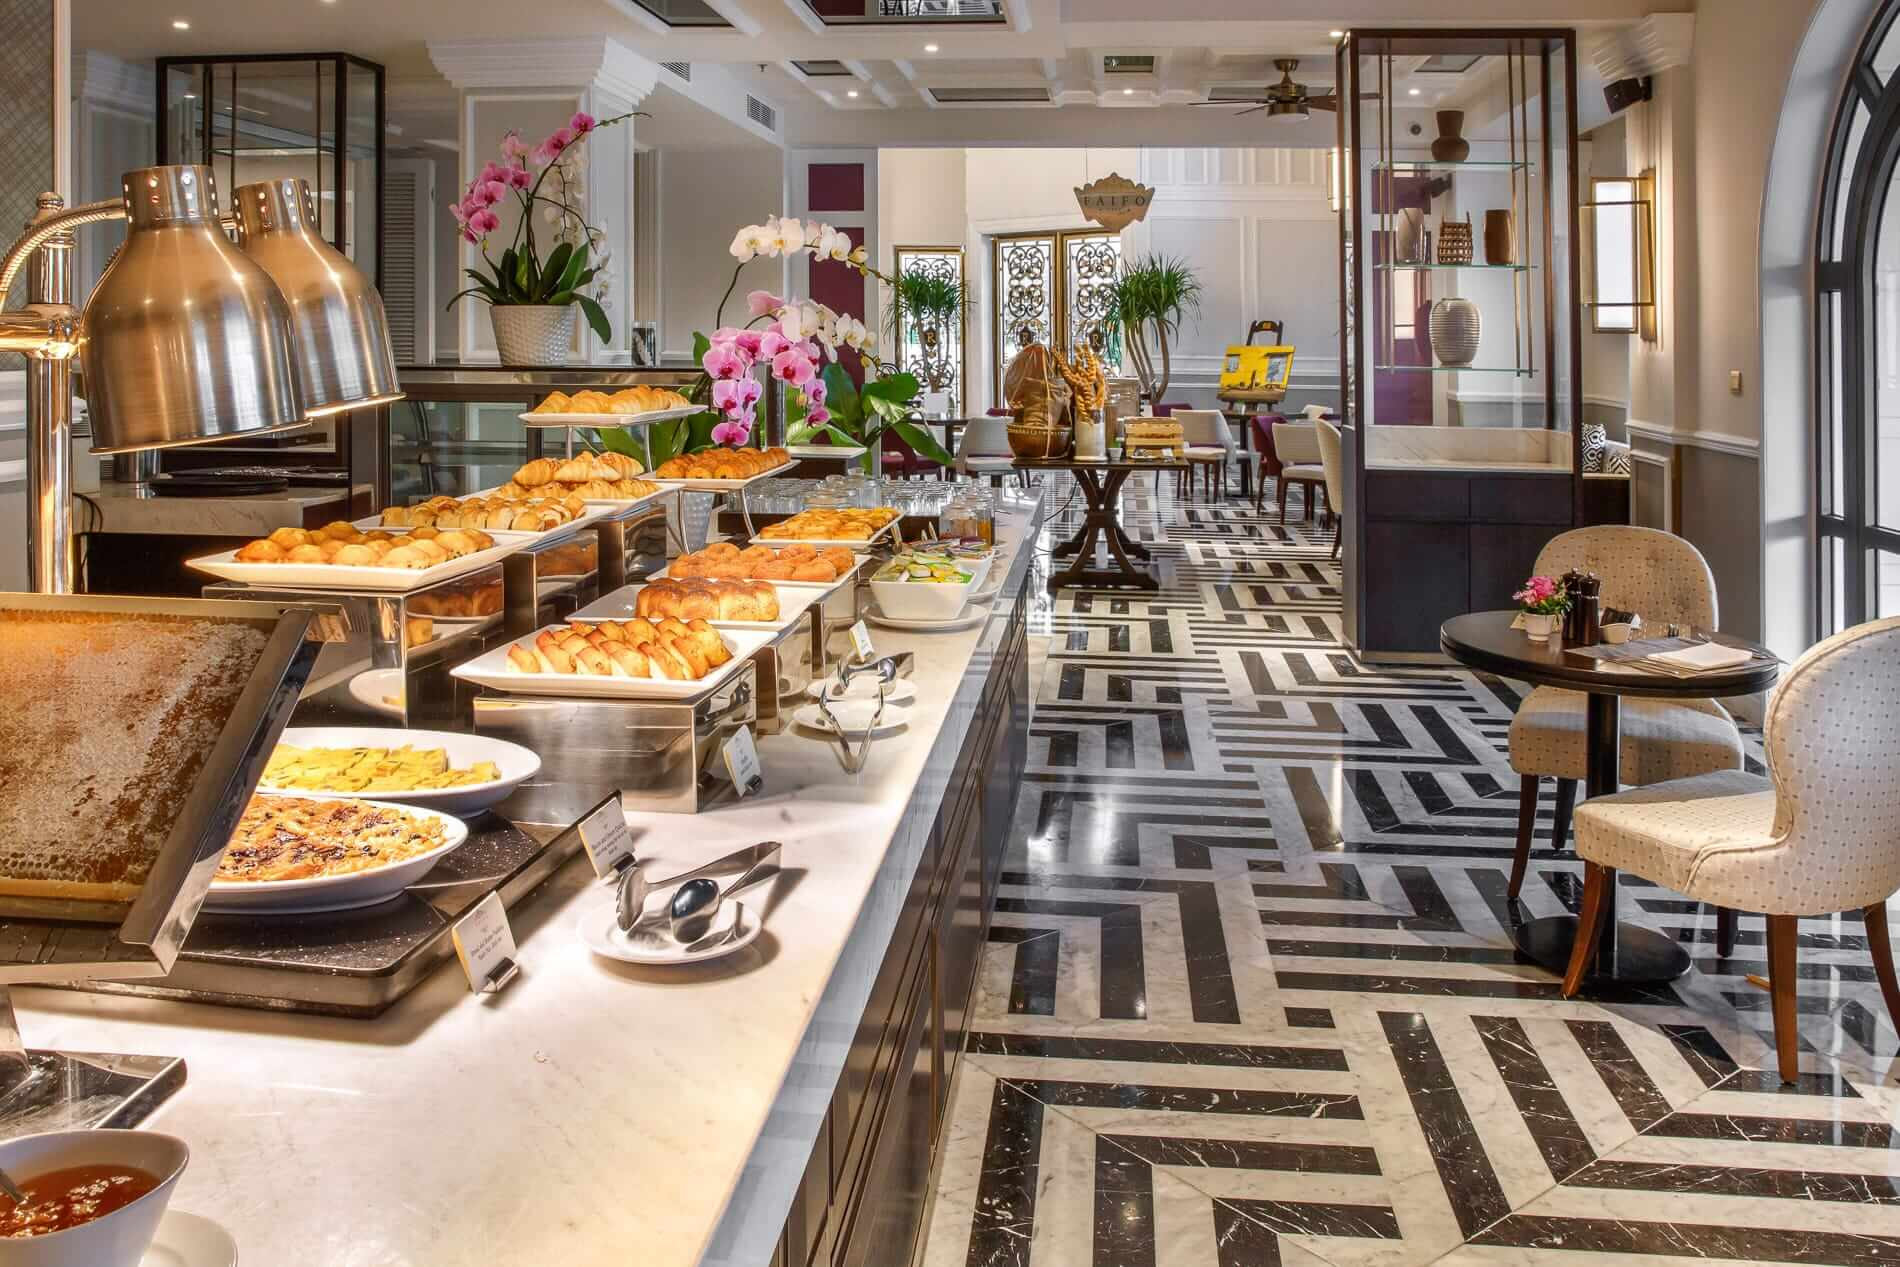 Breakfast buffet at the Faifoo Cafe